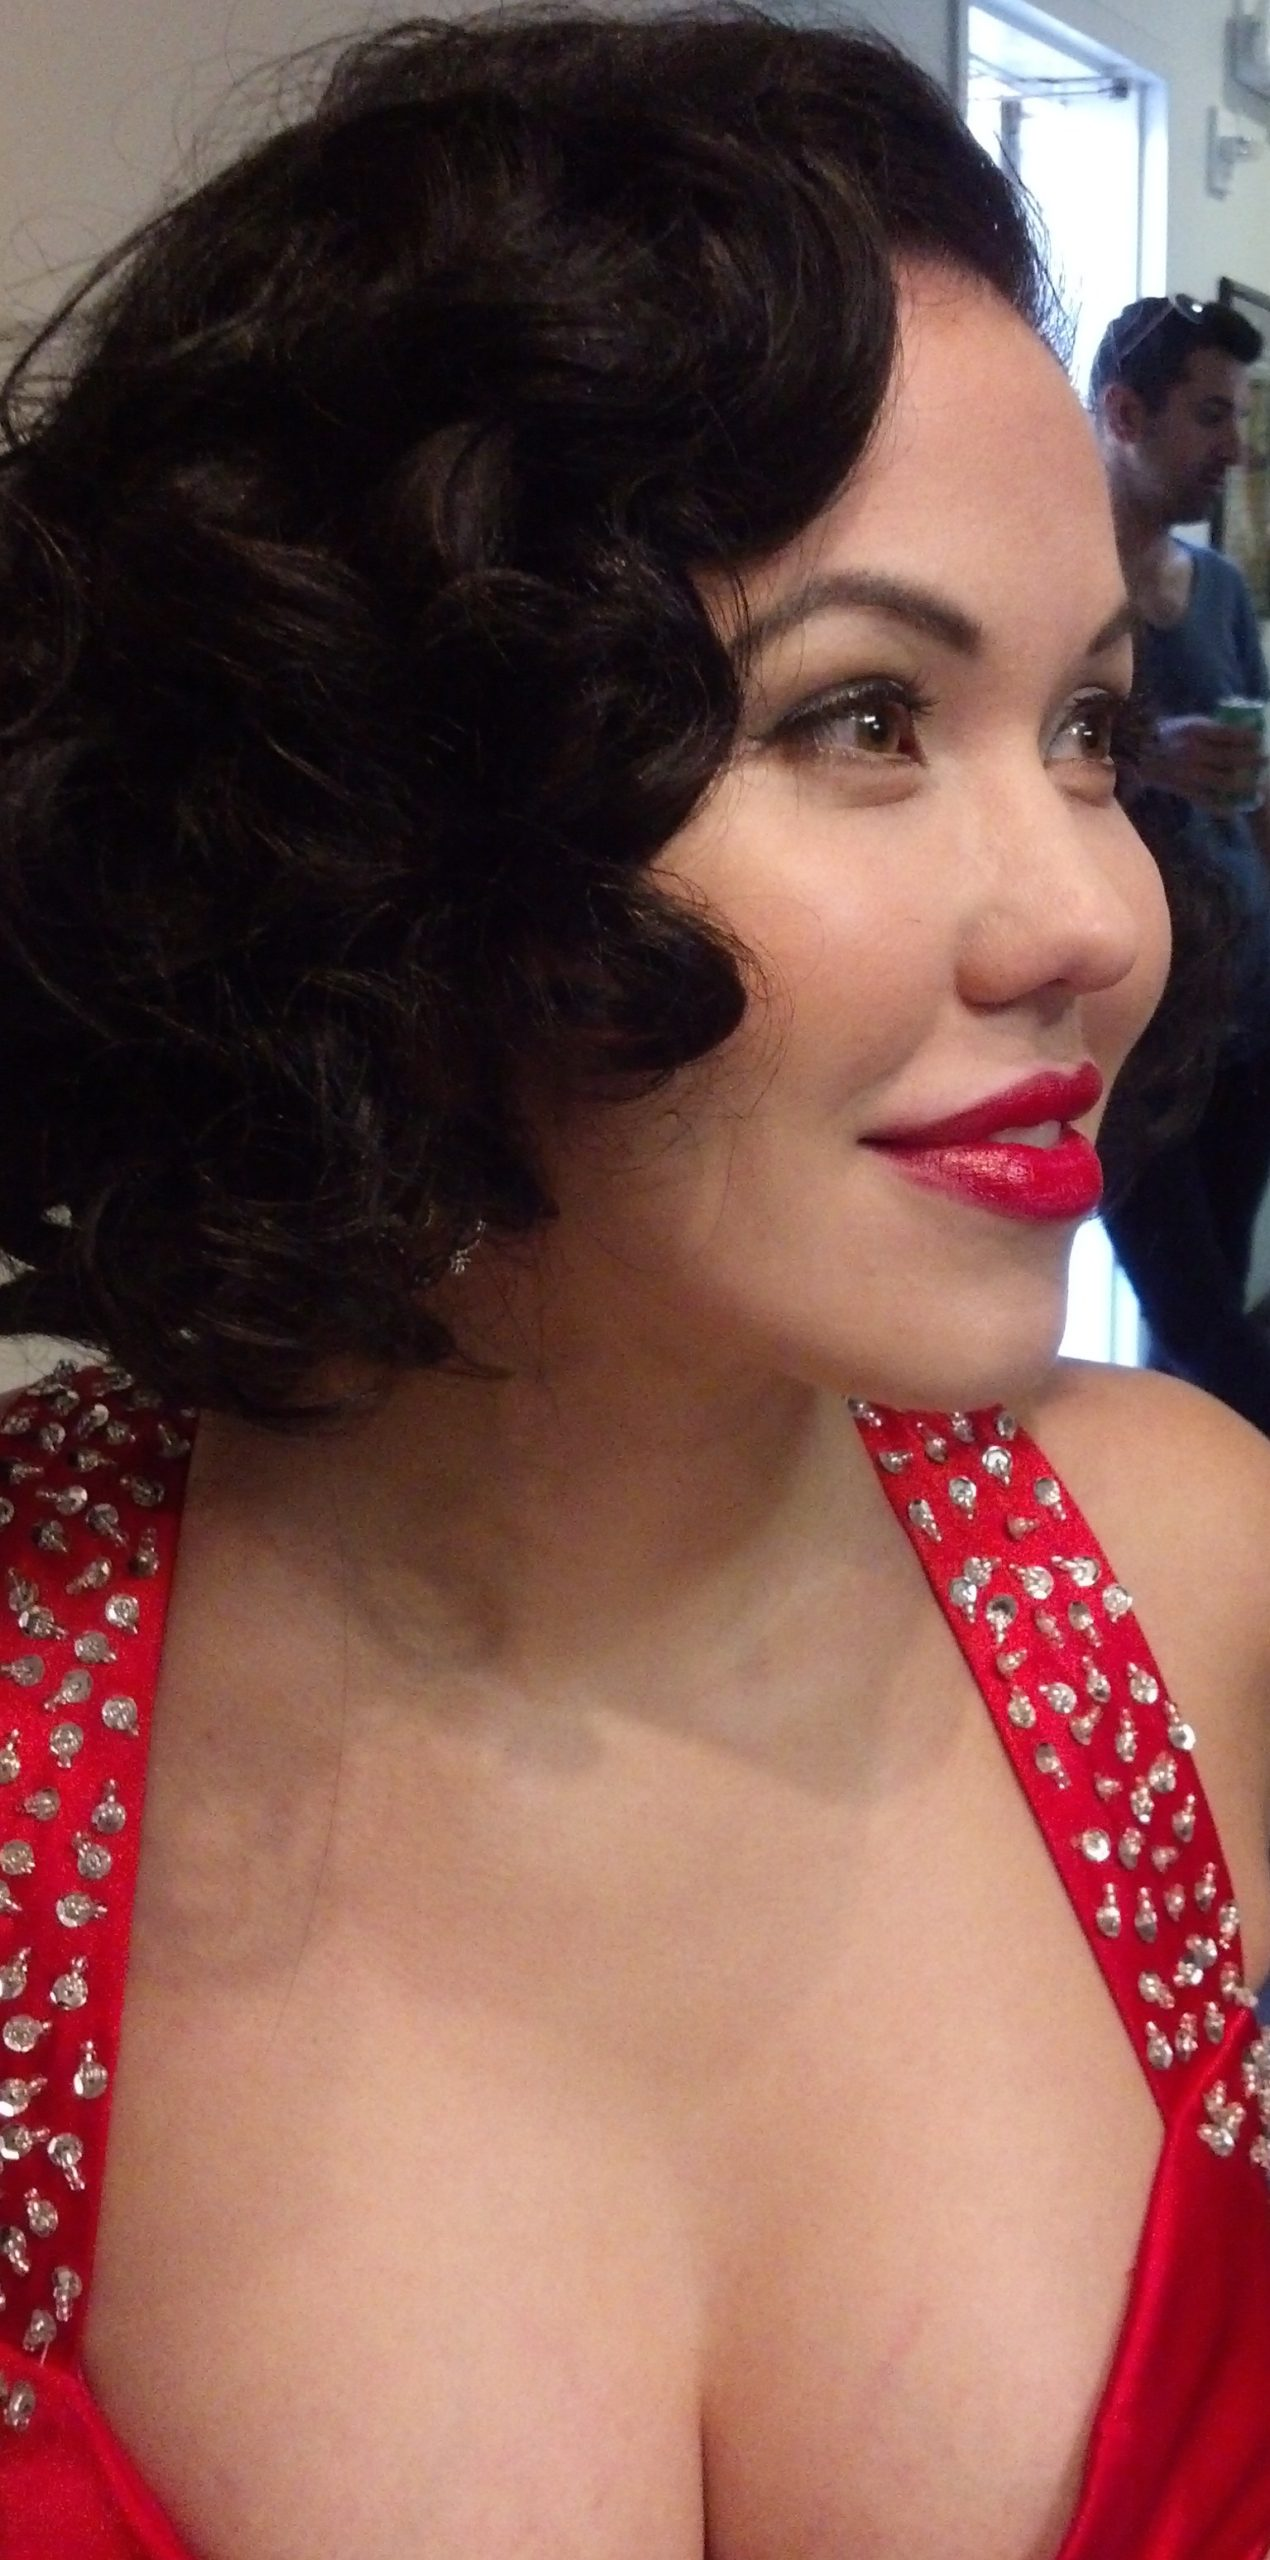 Maya Tremblay as Lena Morgan, Lords of LA